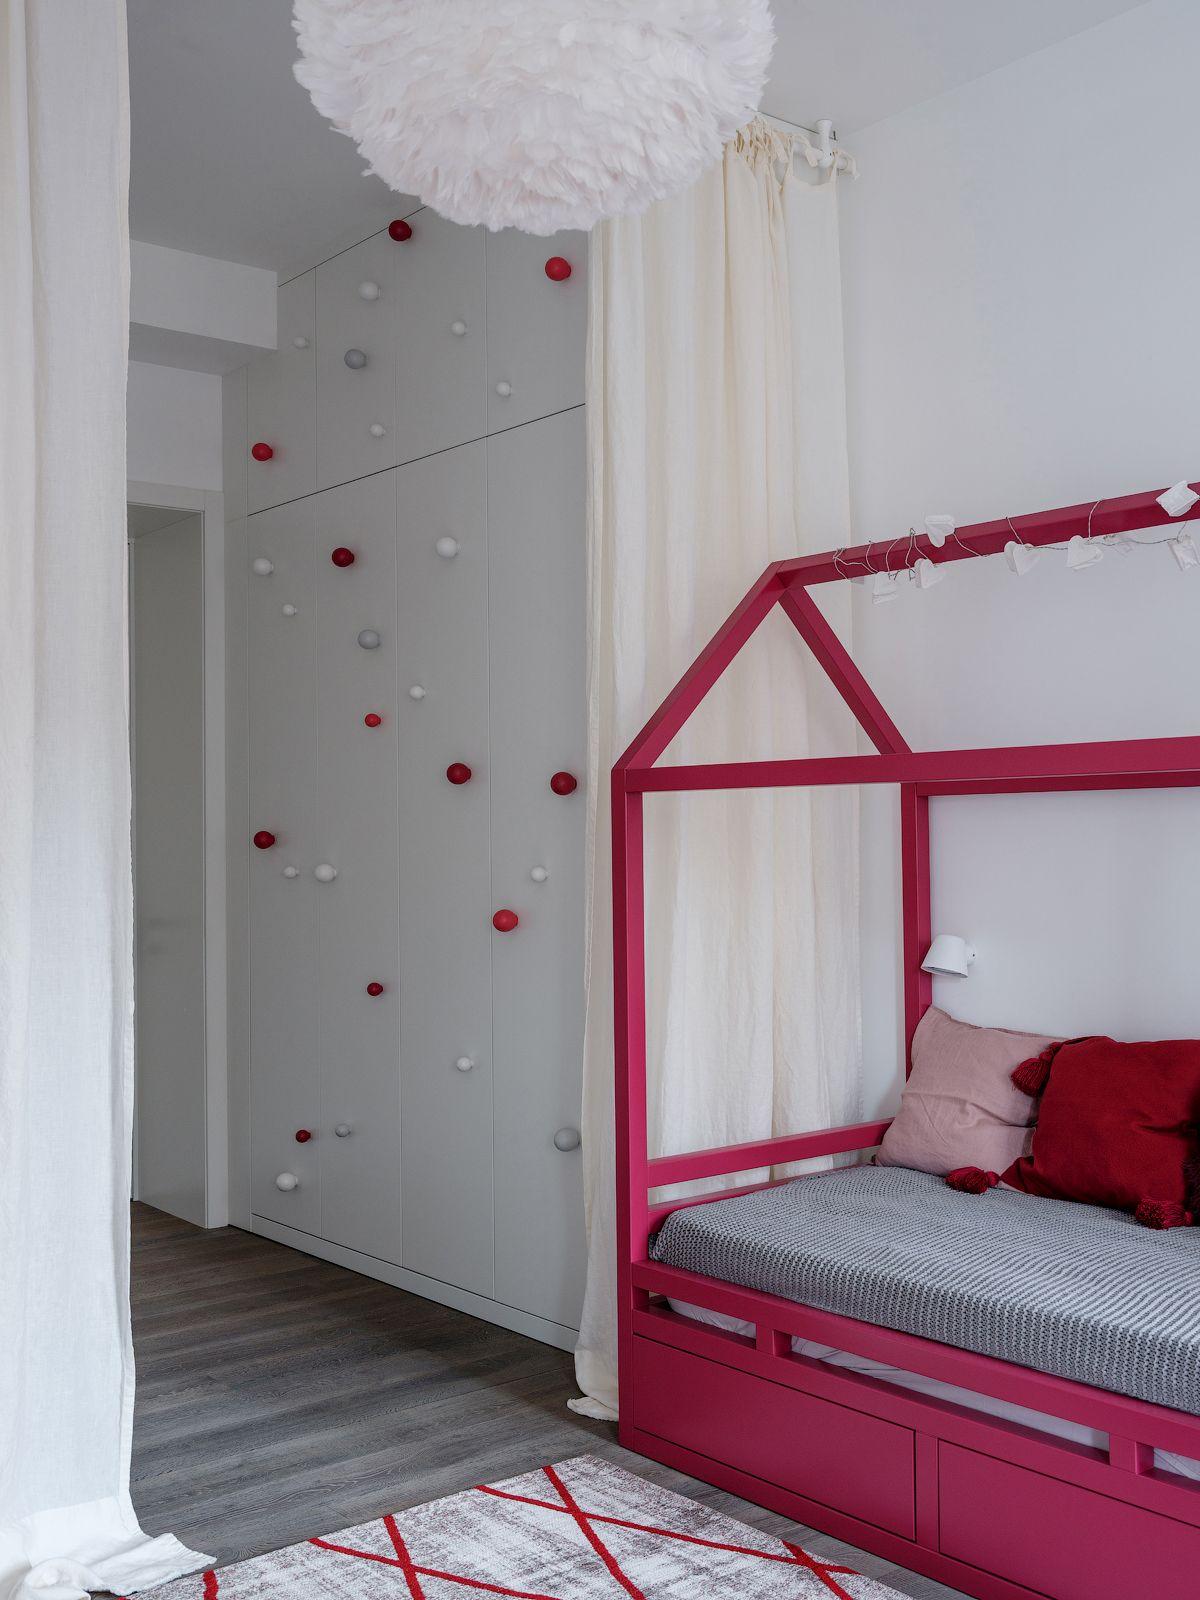 adelaparvu.com despre apartament 90 mp, design Minina Design, Foto Mikhail Loskutov (22)